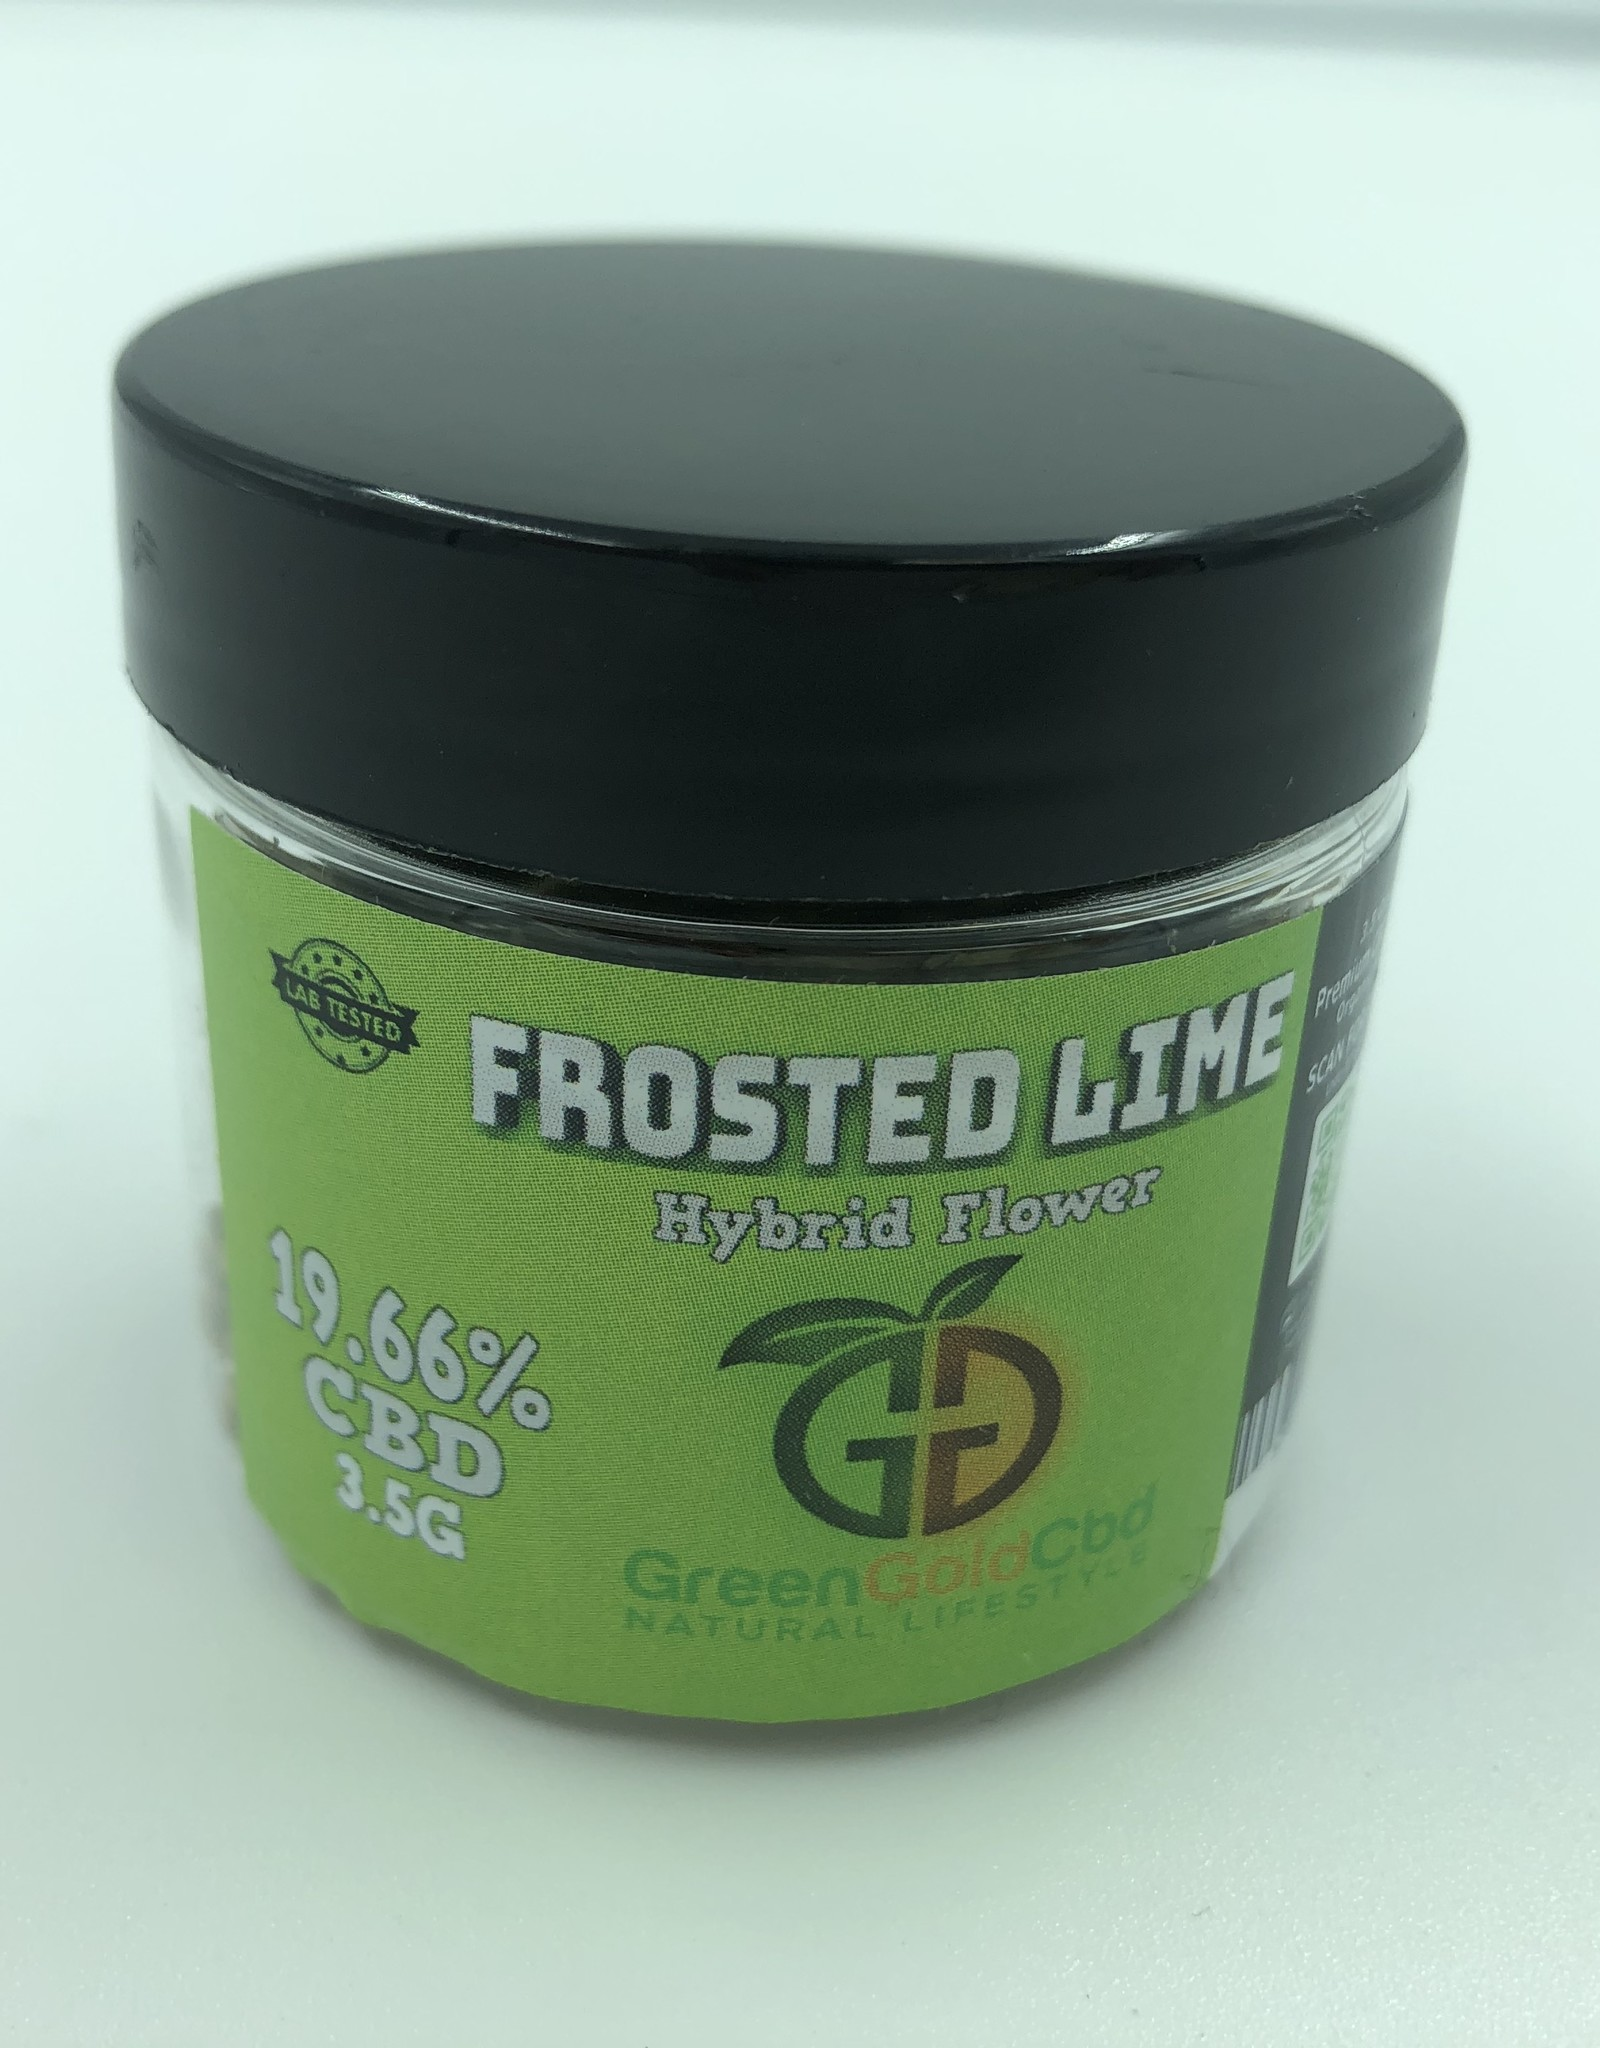 Green Gold CBD CBD Flower Frosted Lime, 19.66% CBD 3.5g